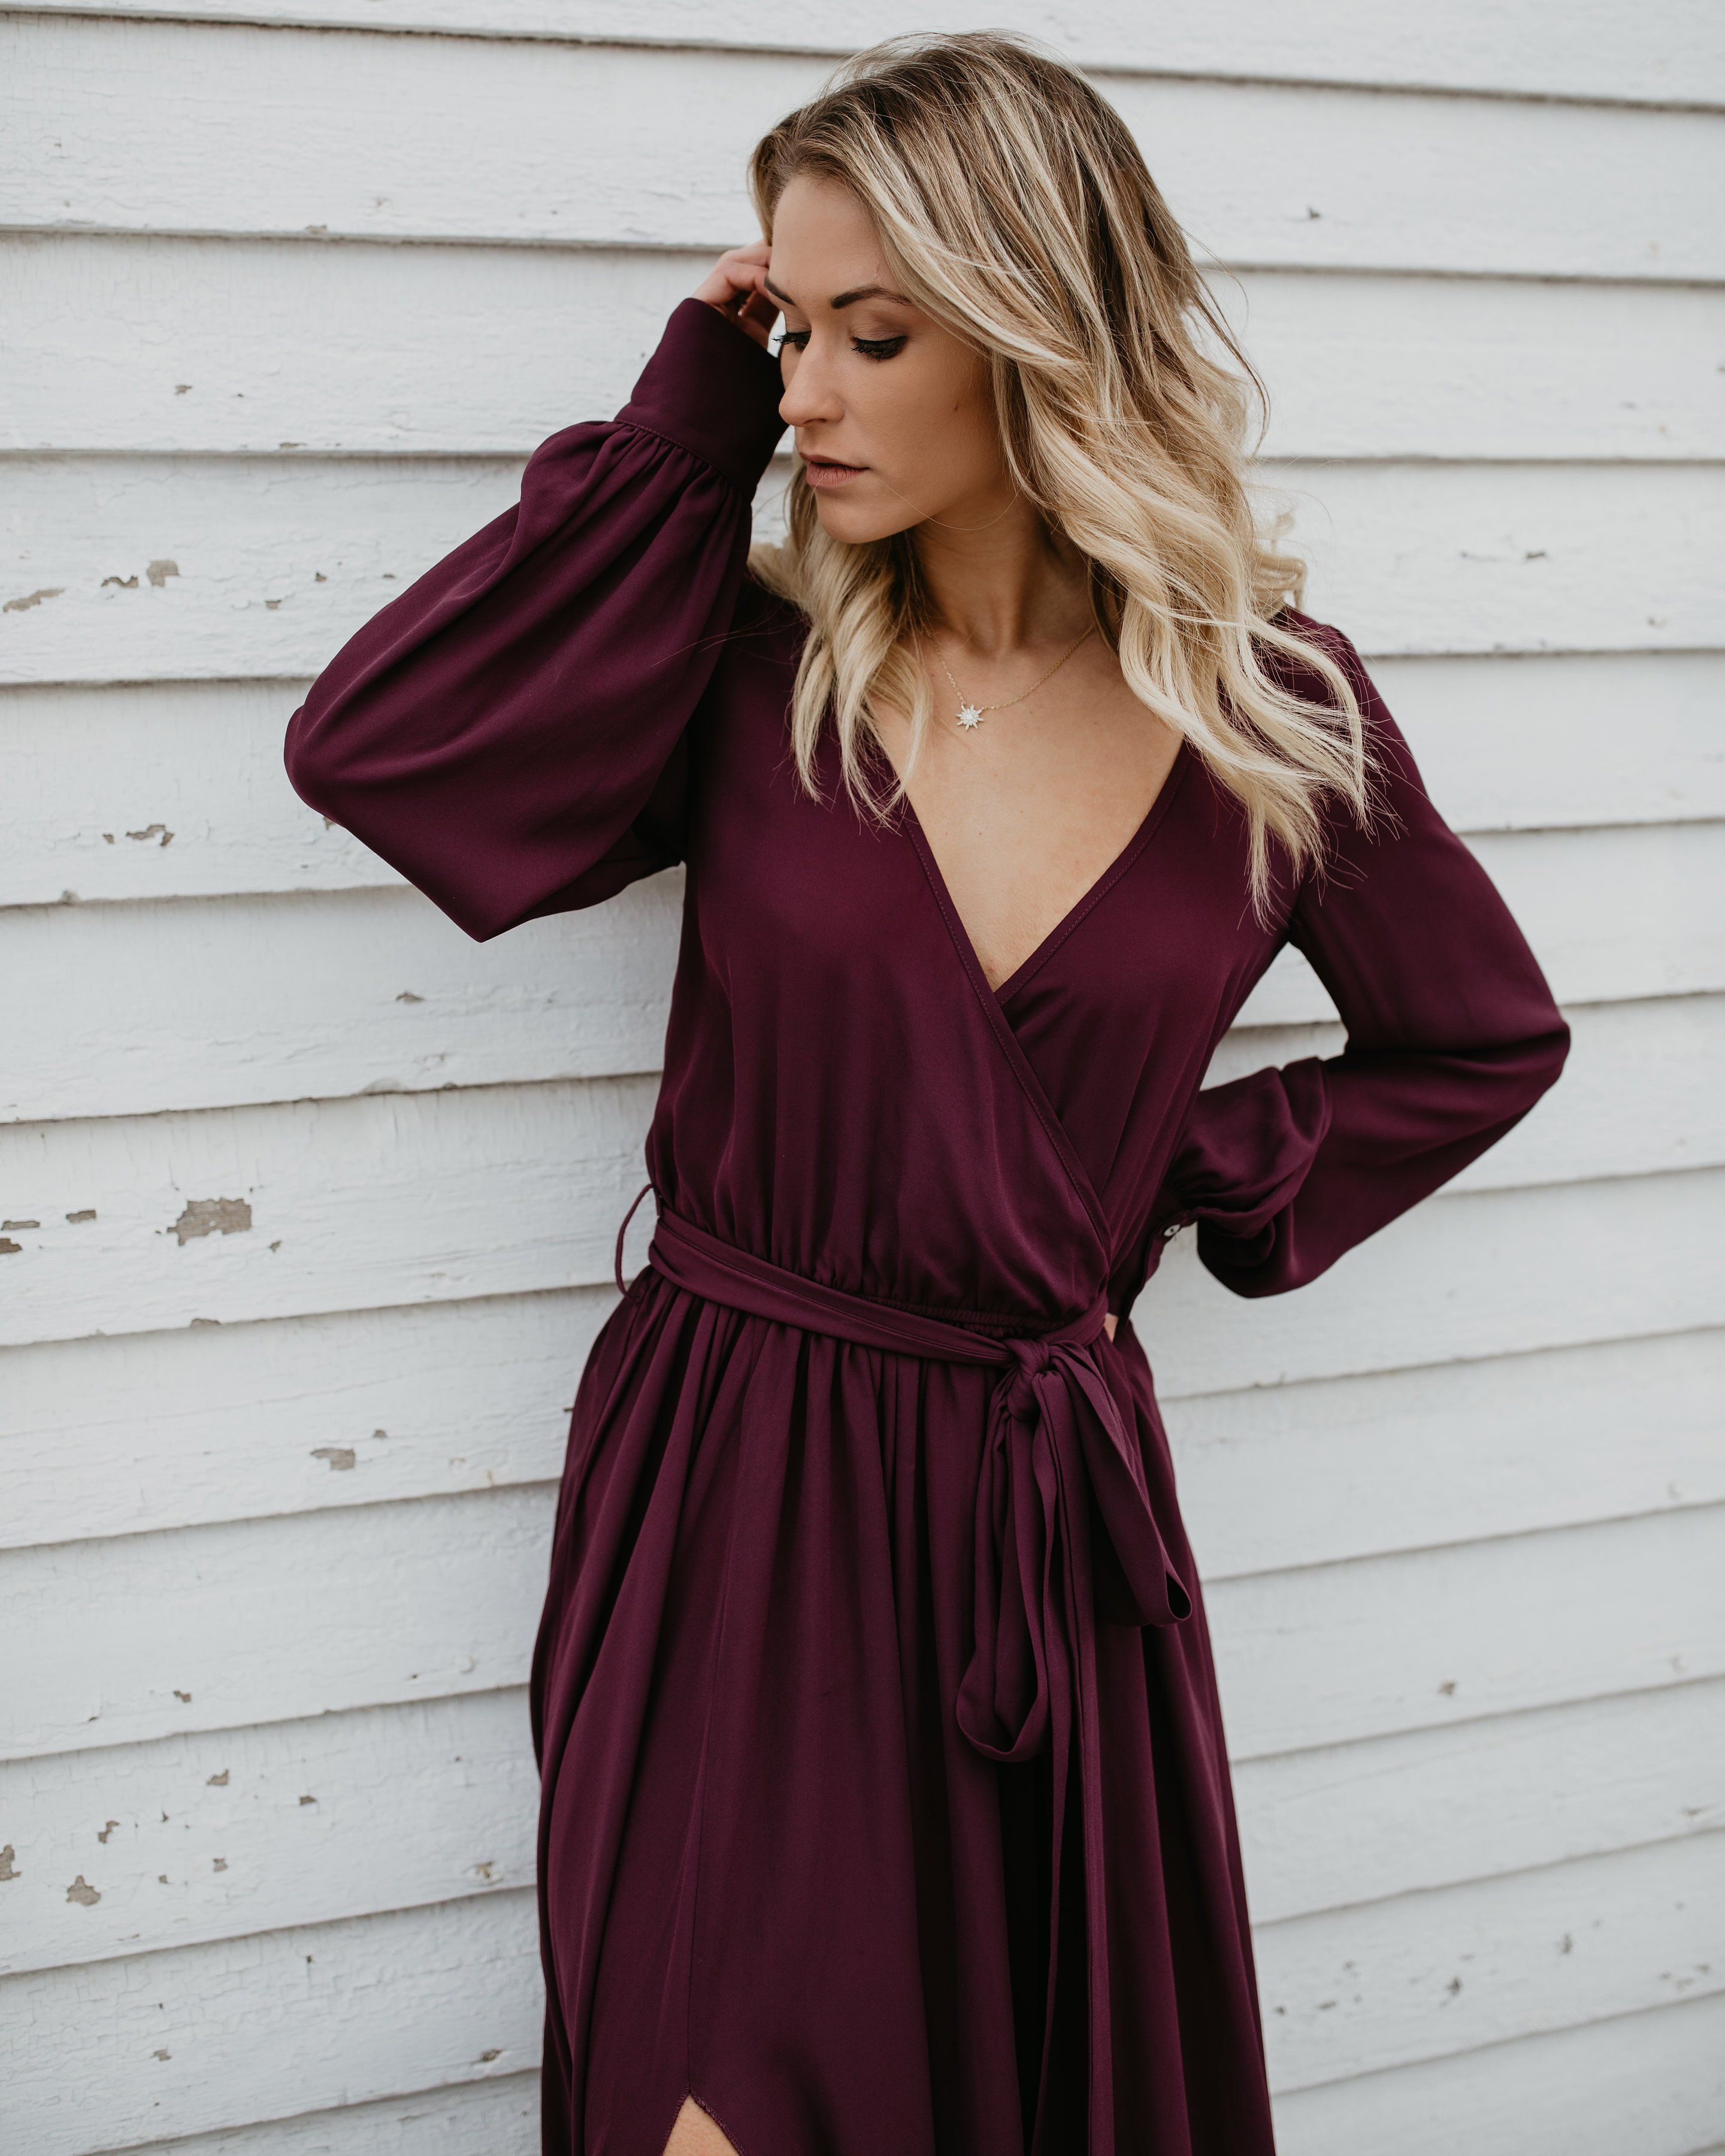 b896068a15 Long Sleeve Diana Maxi Dress - Wine